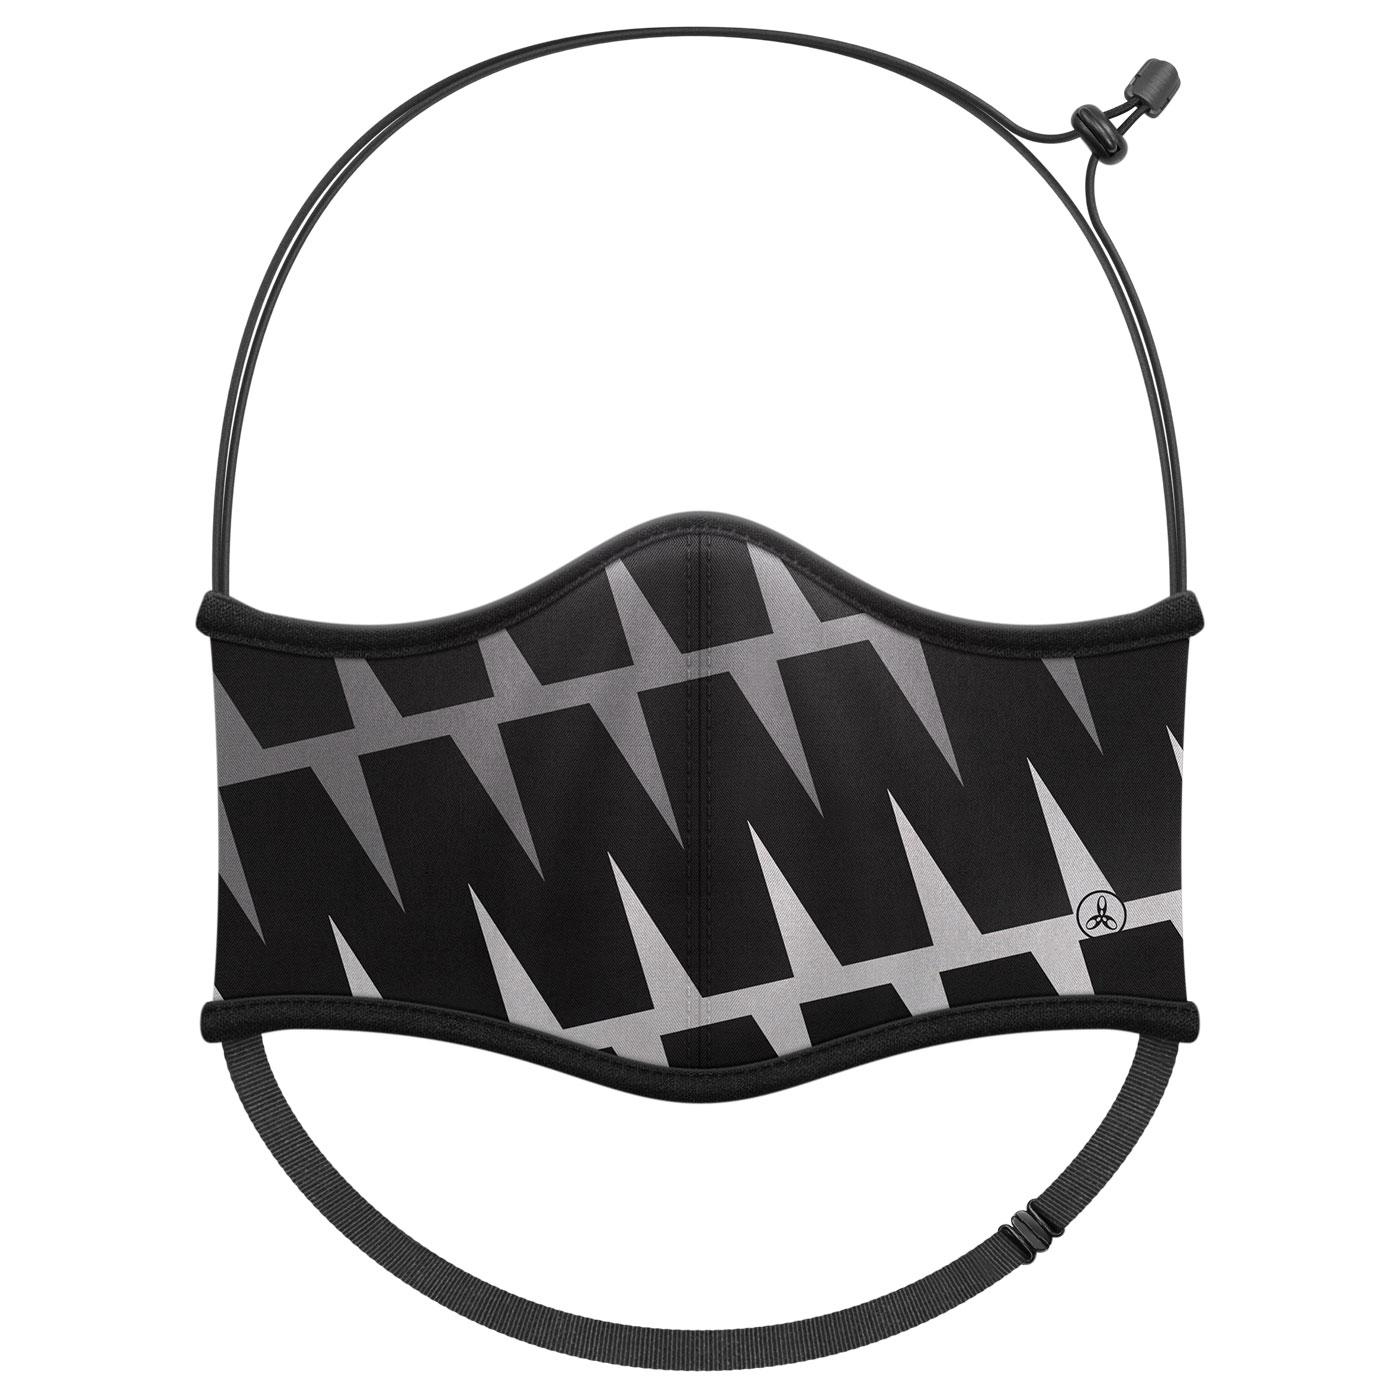 HODARLA 運動舒適口罩6032201 - 黑白